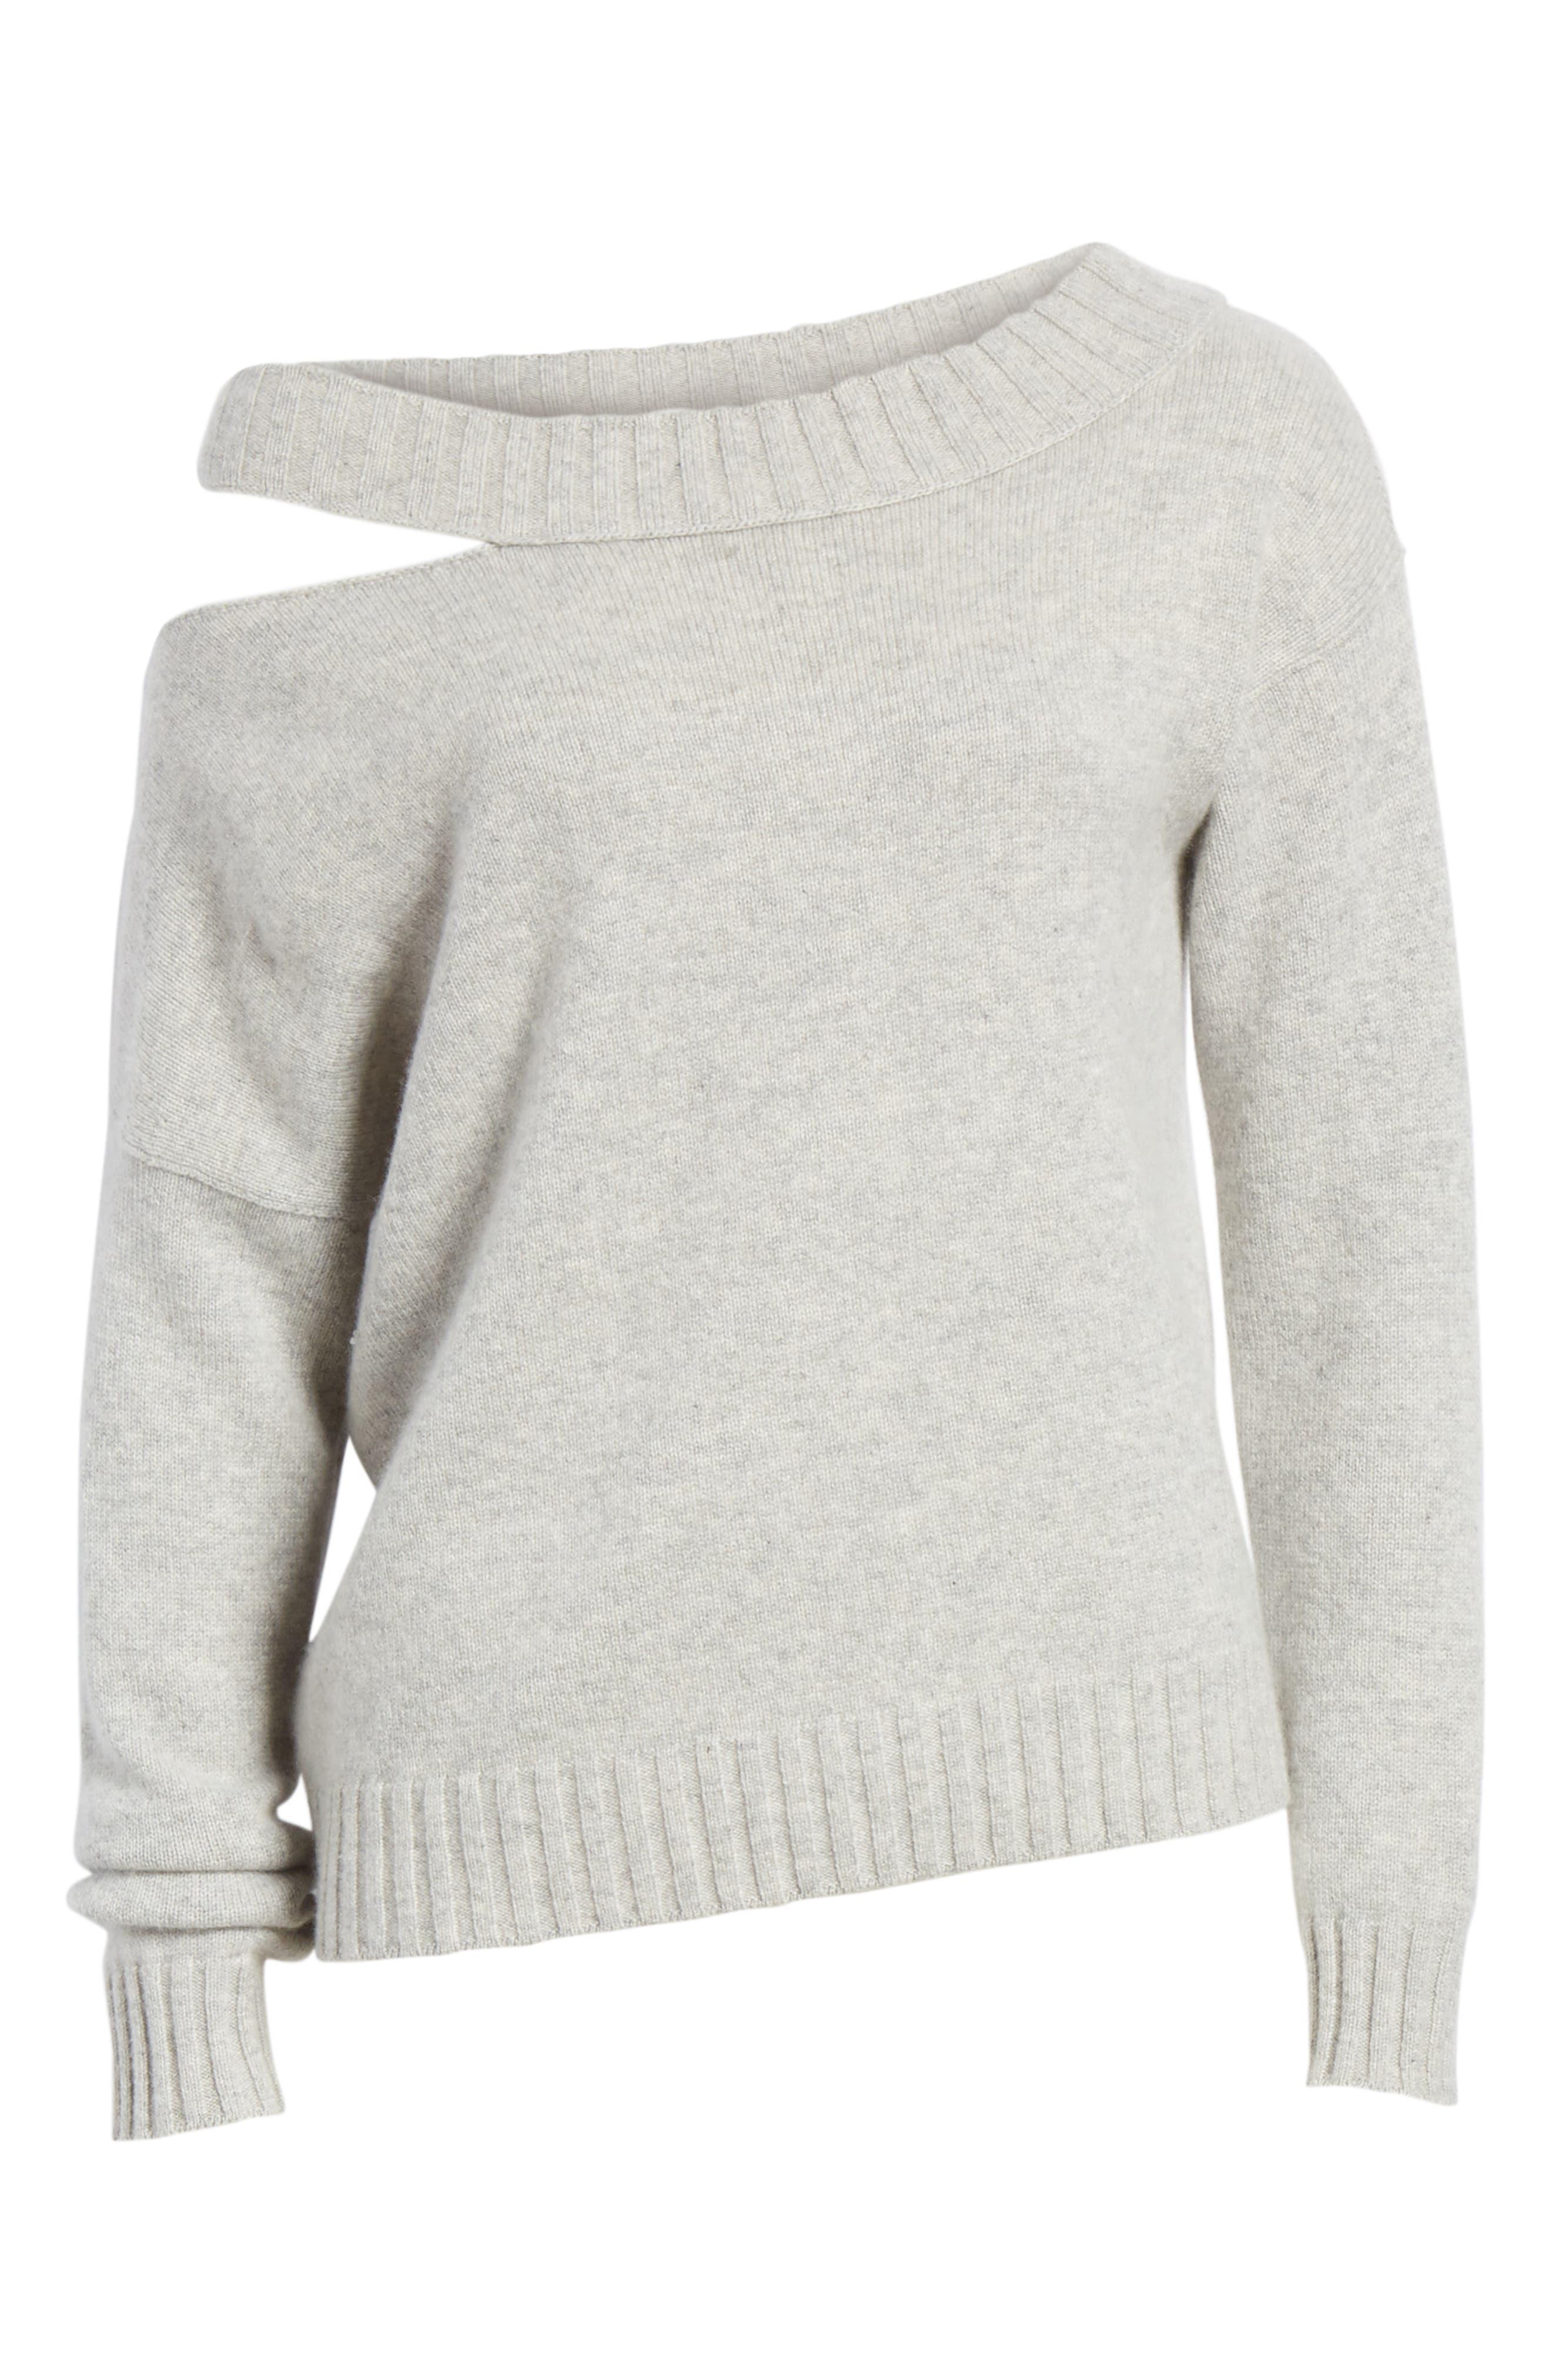 One Shoulder Slit Pullover Sweater,                             Alternate thumbnail 6, color,                             LIGHT HEATHER GREY